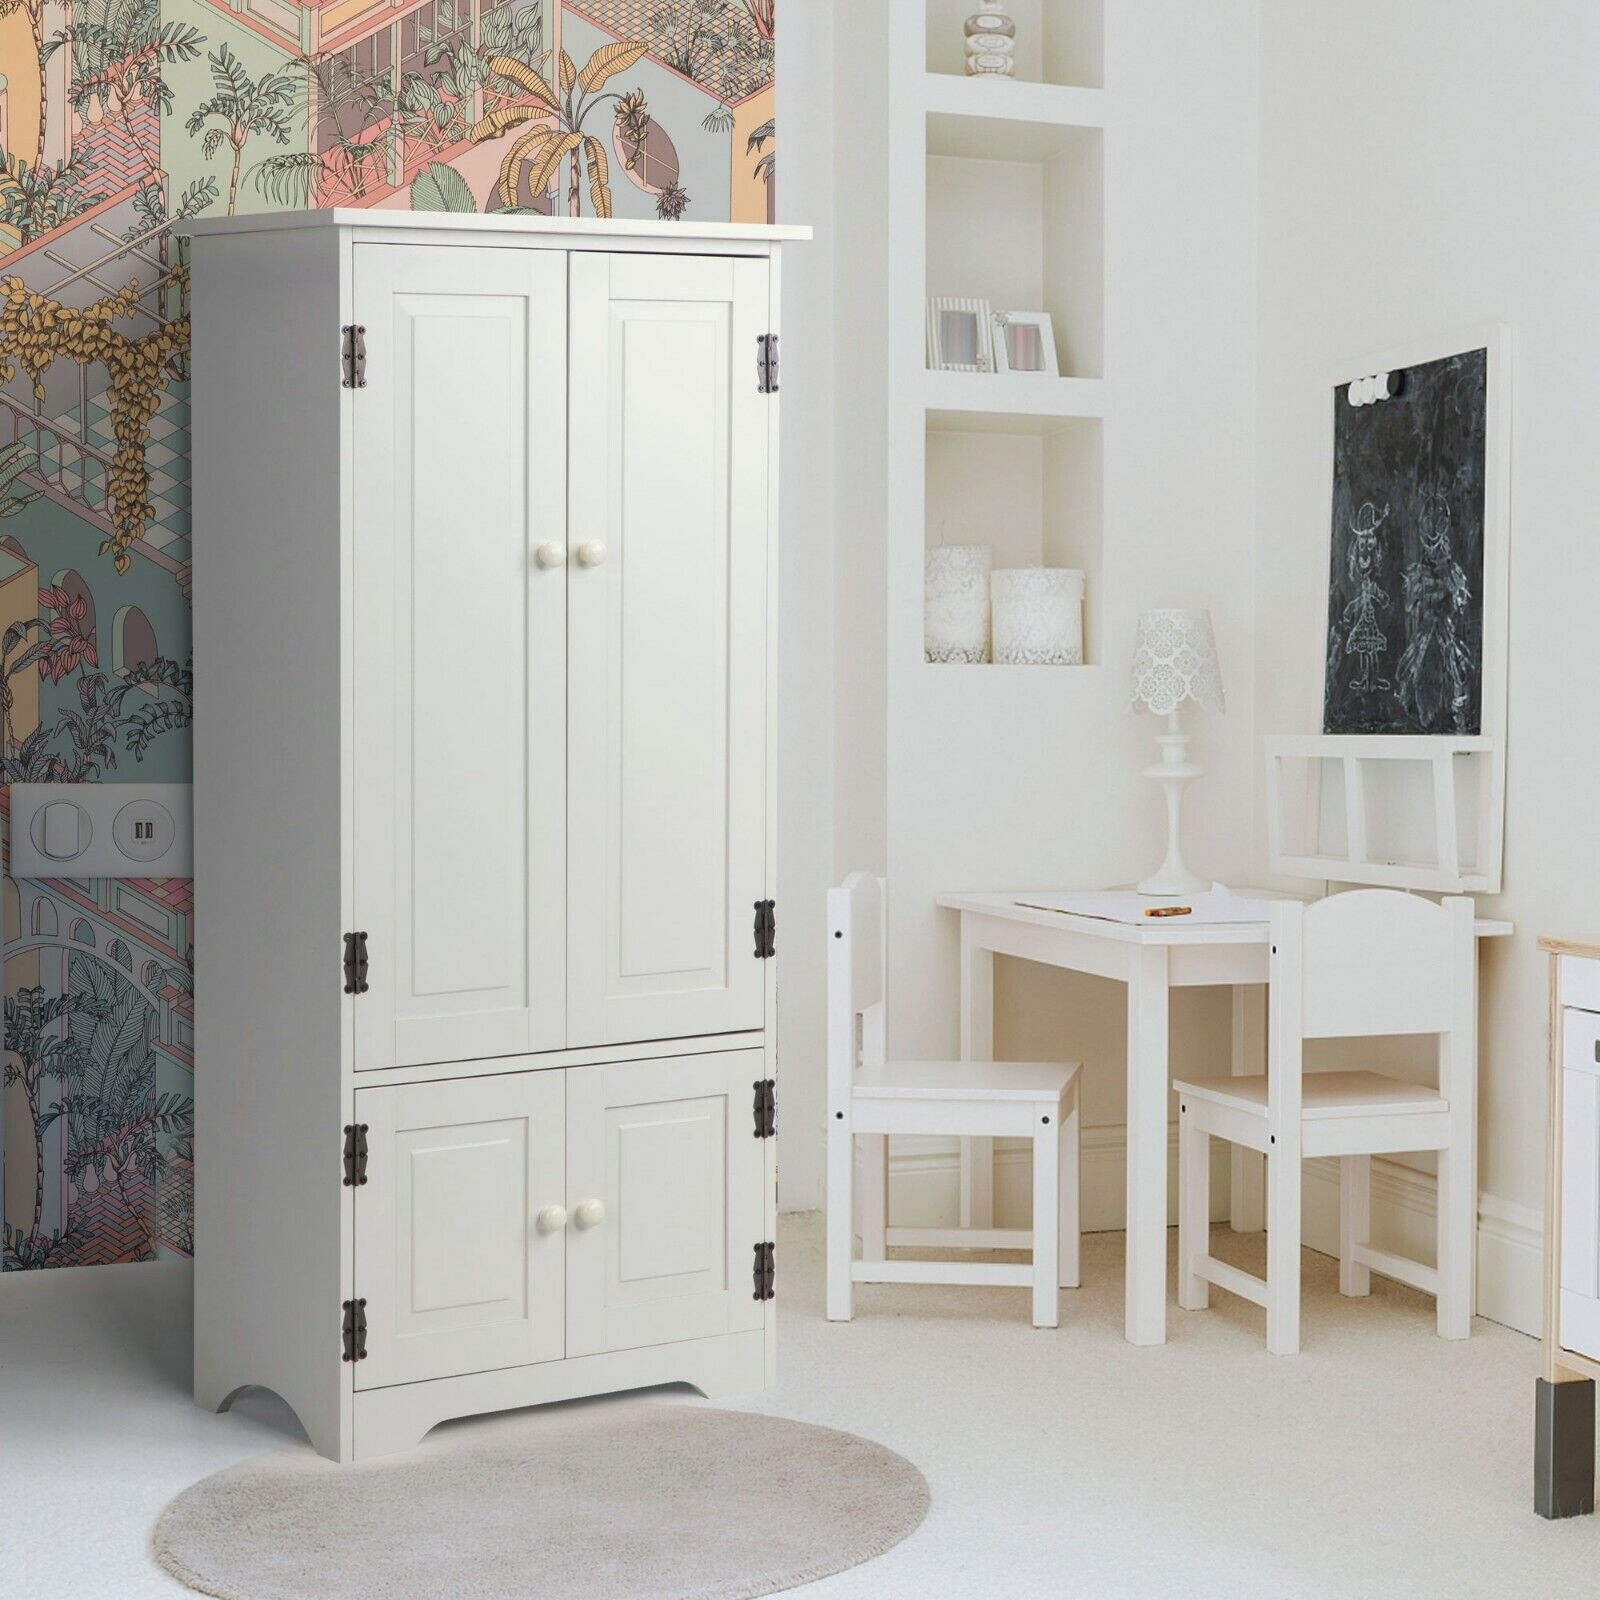 Wood Storage Cabinet Organizer w/2 Doors Adjustable Shelves